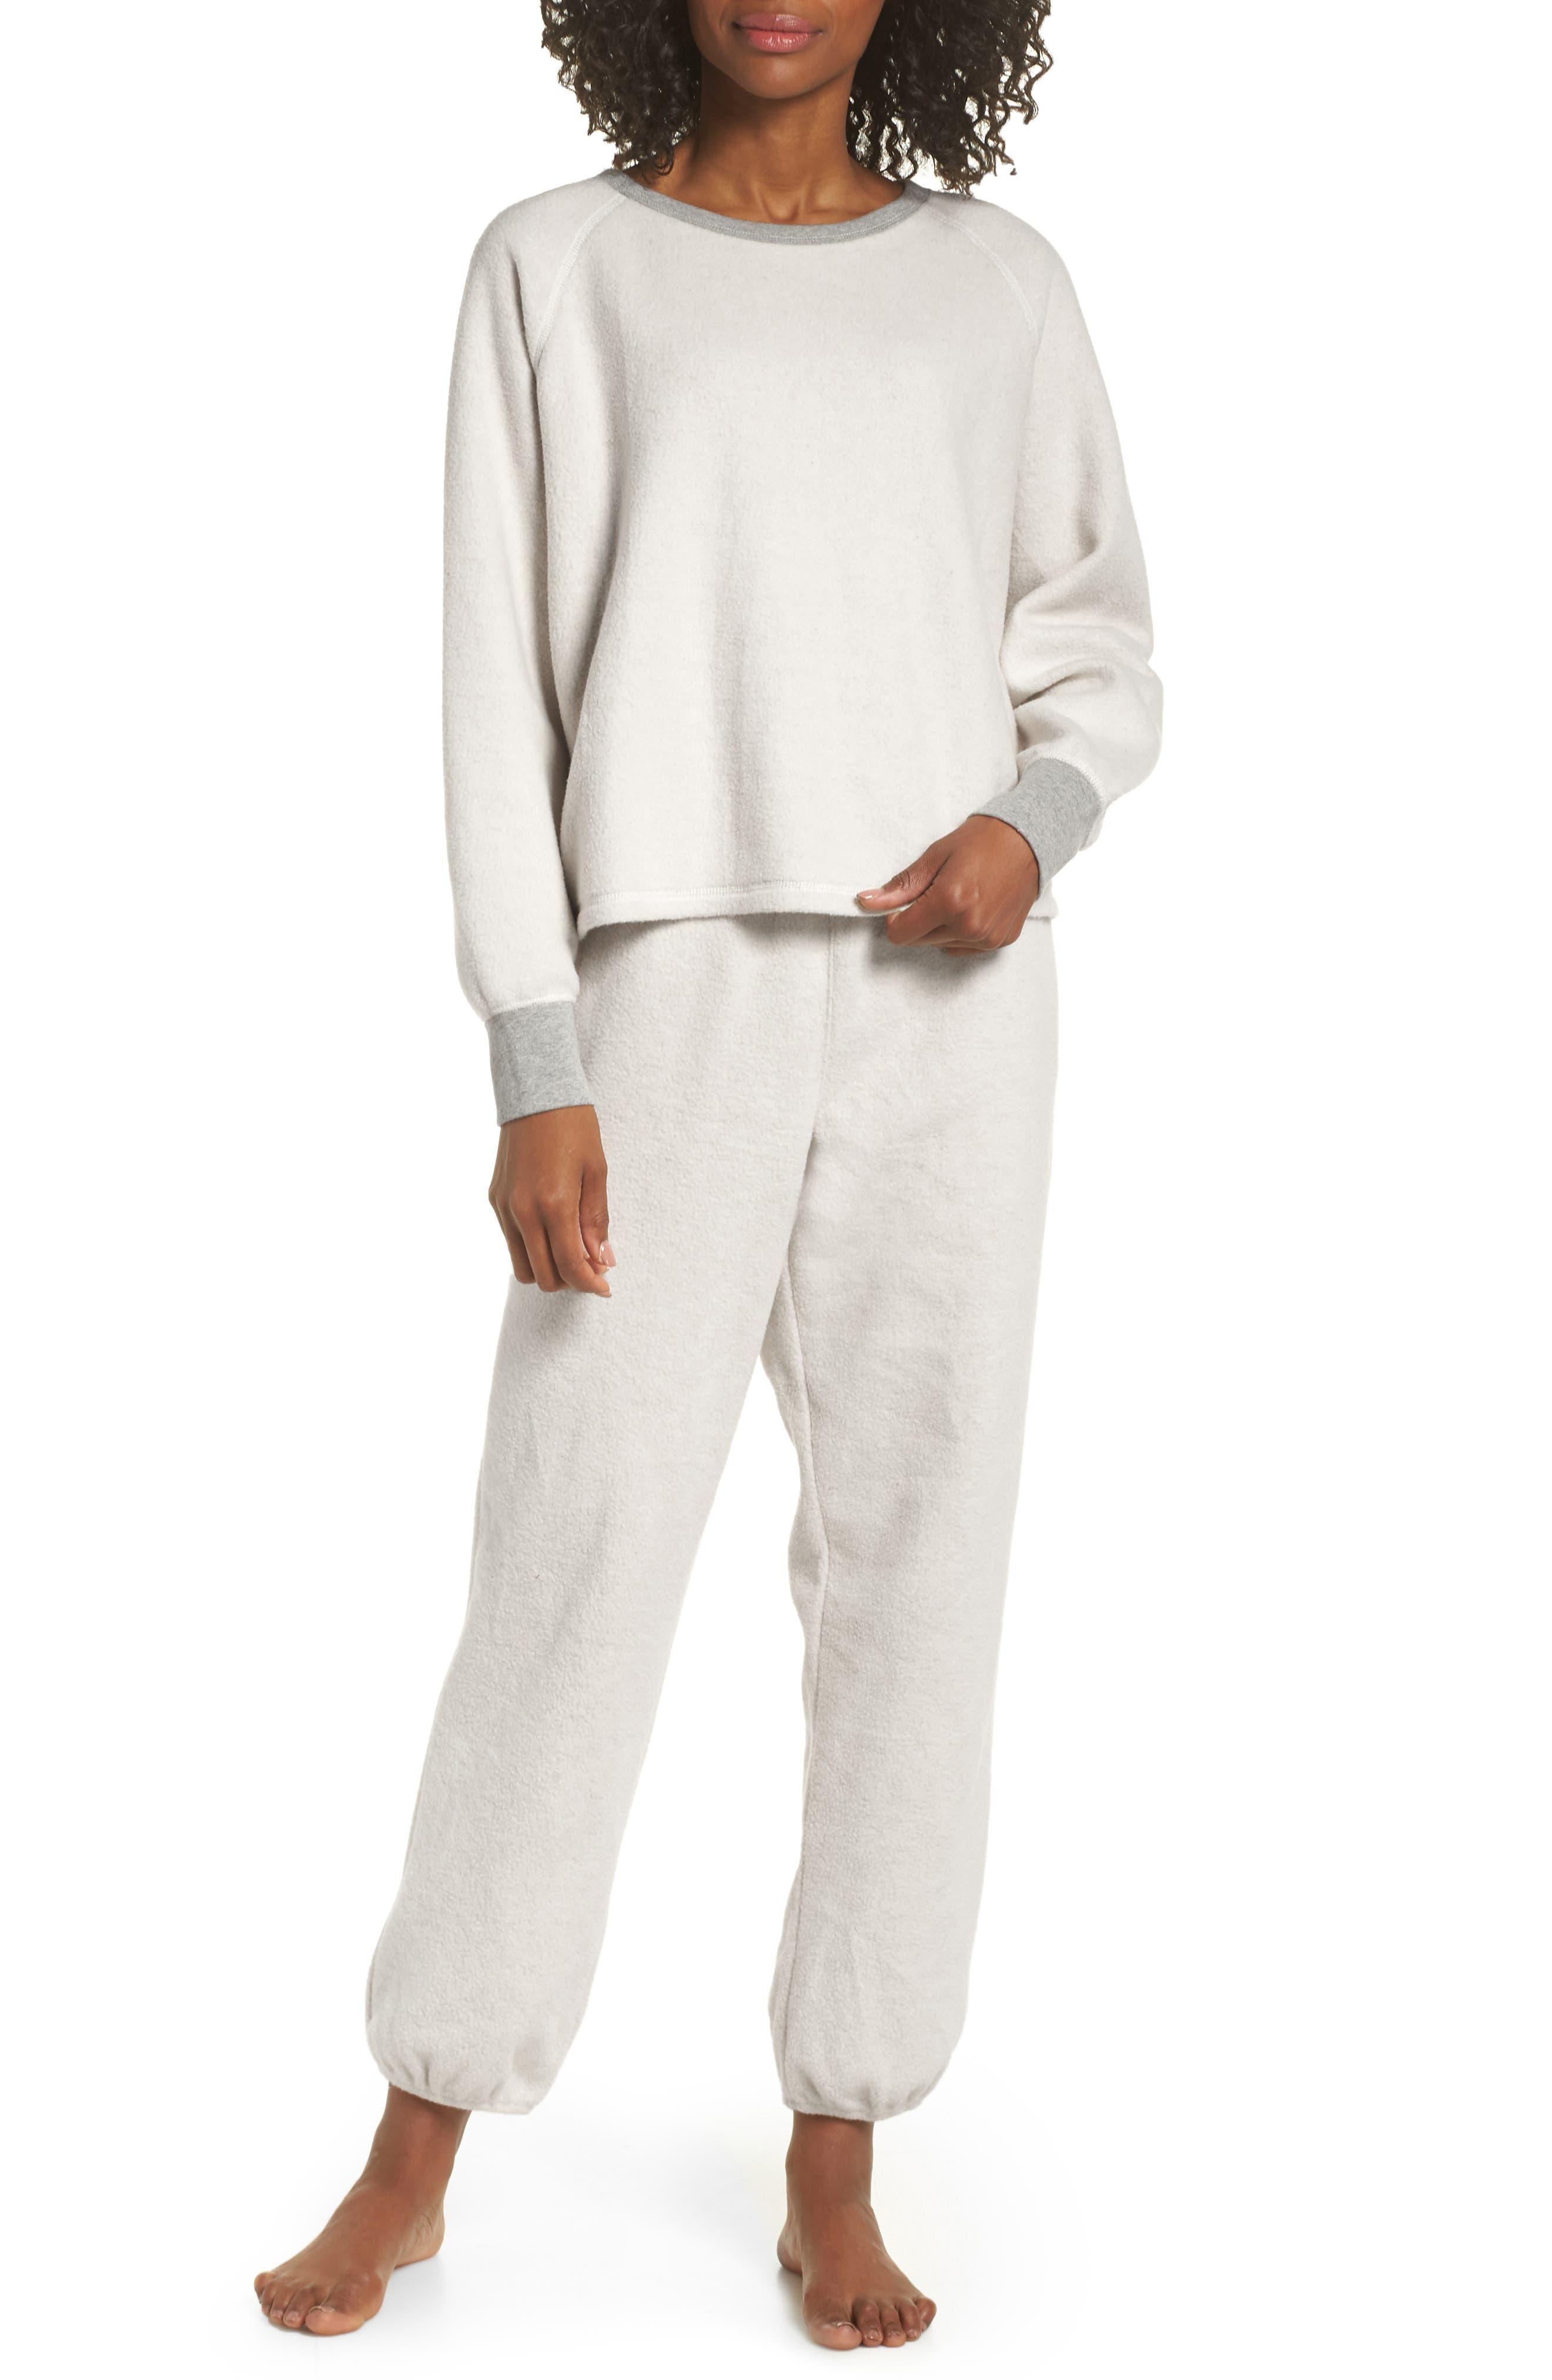 MADEWELL, Fleece Pajama Sweatshirt, Alternate thumbnail 7, color, 020